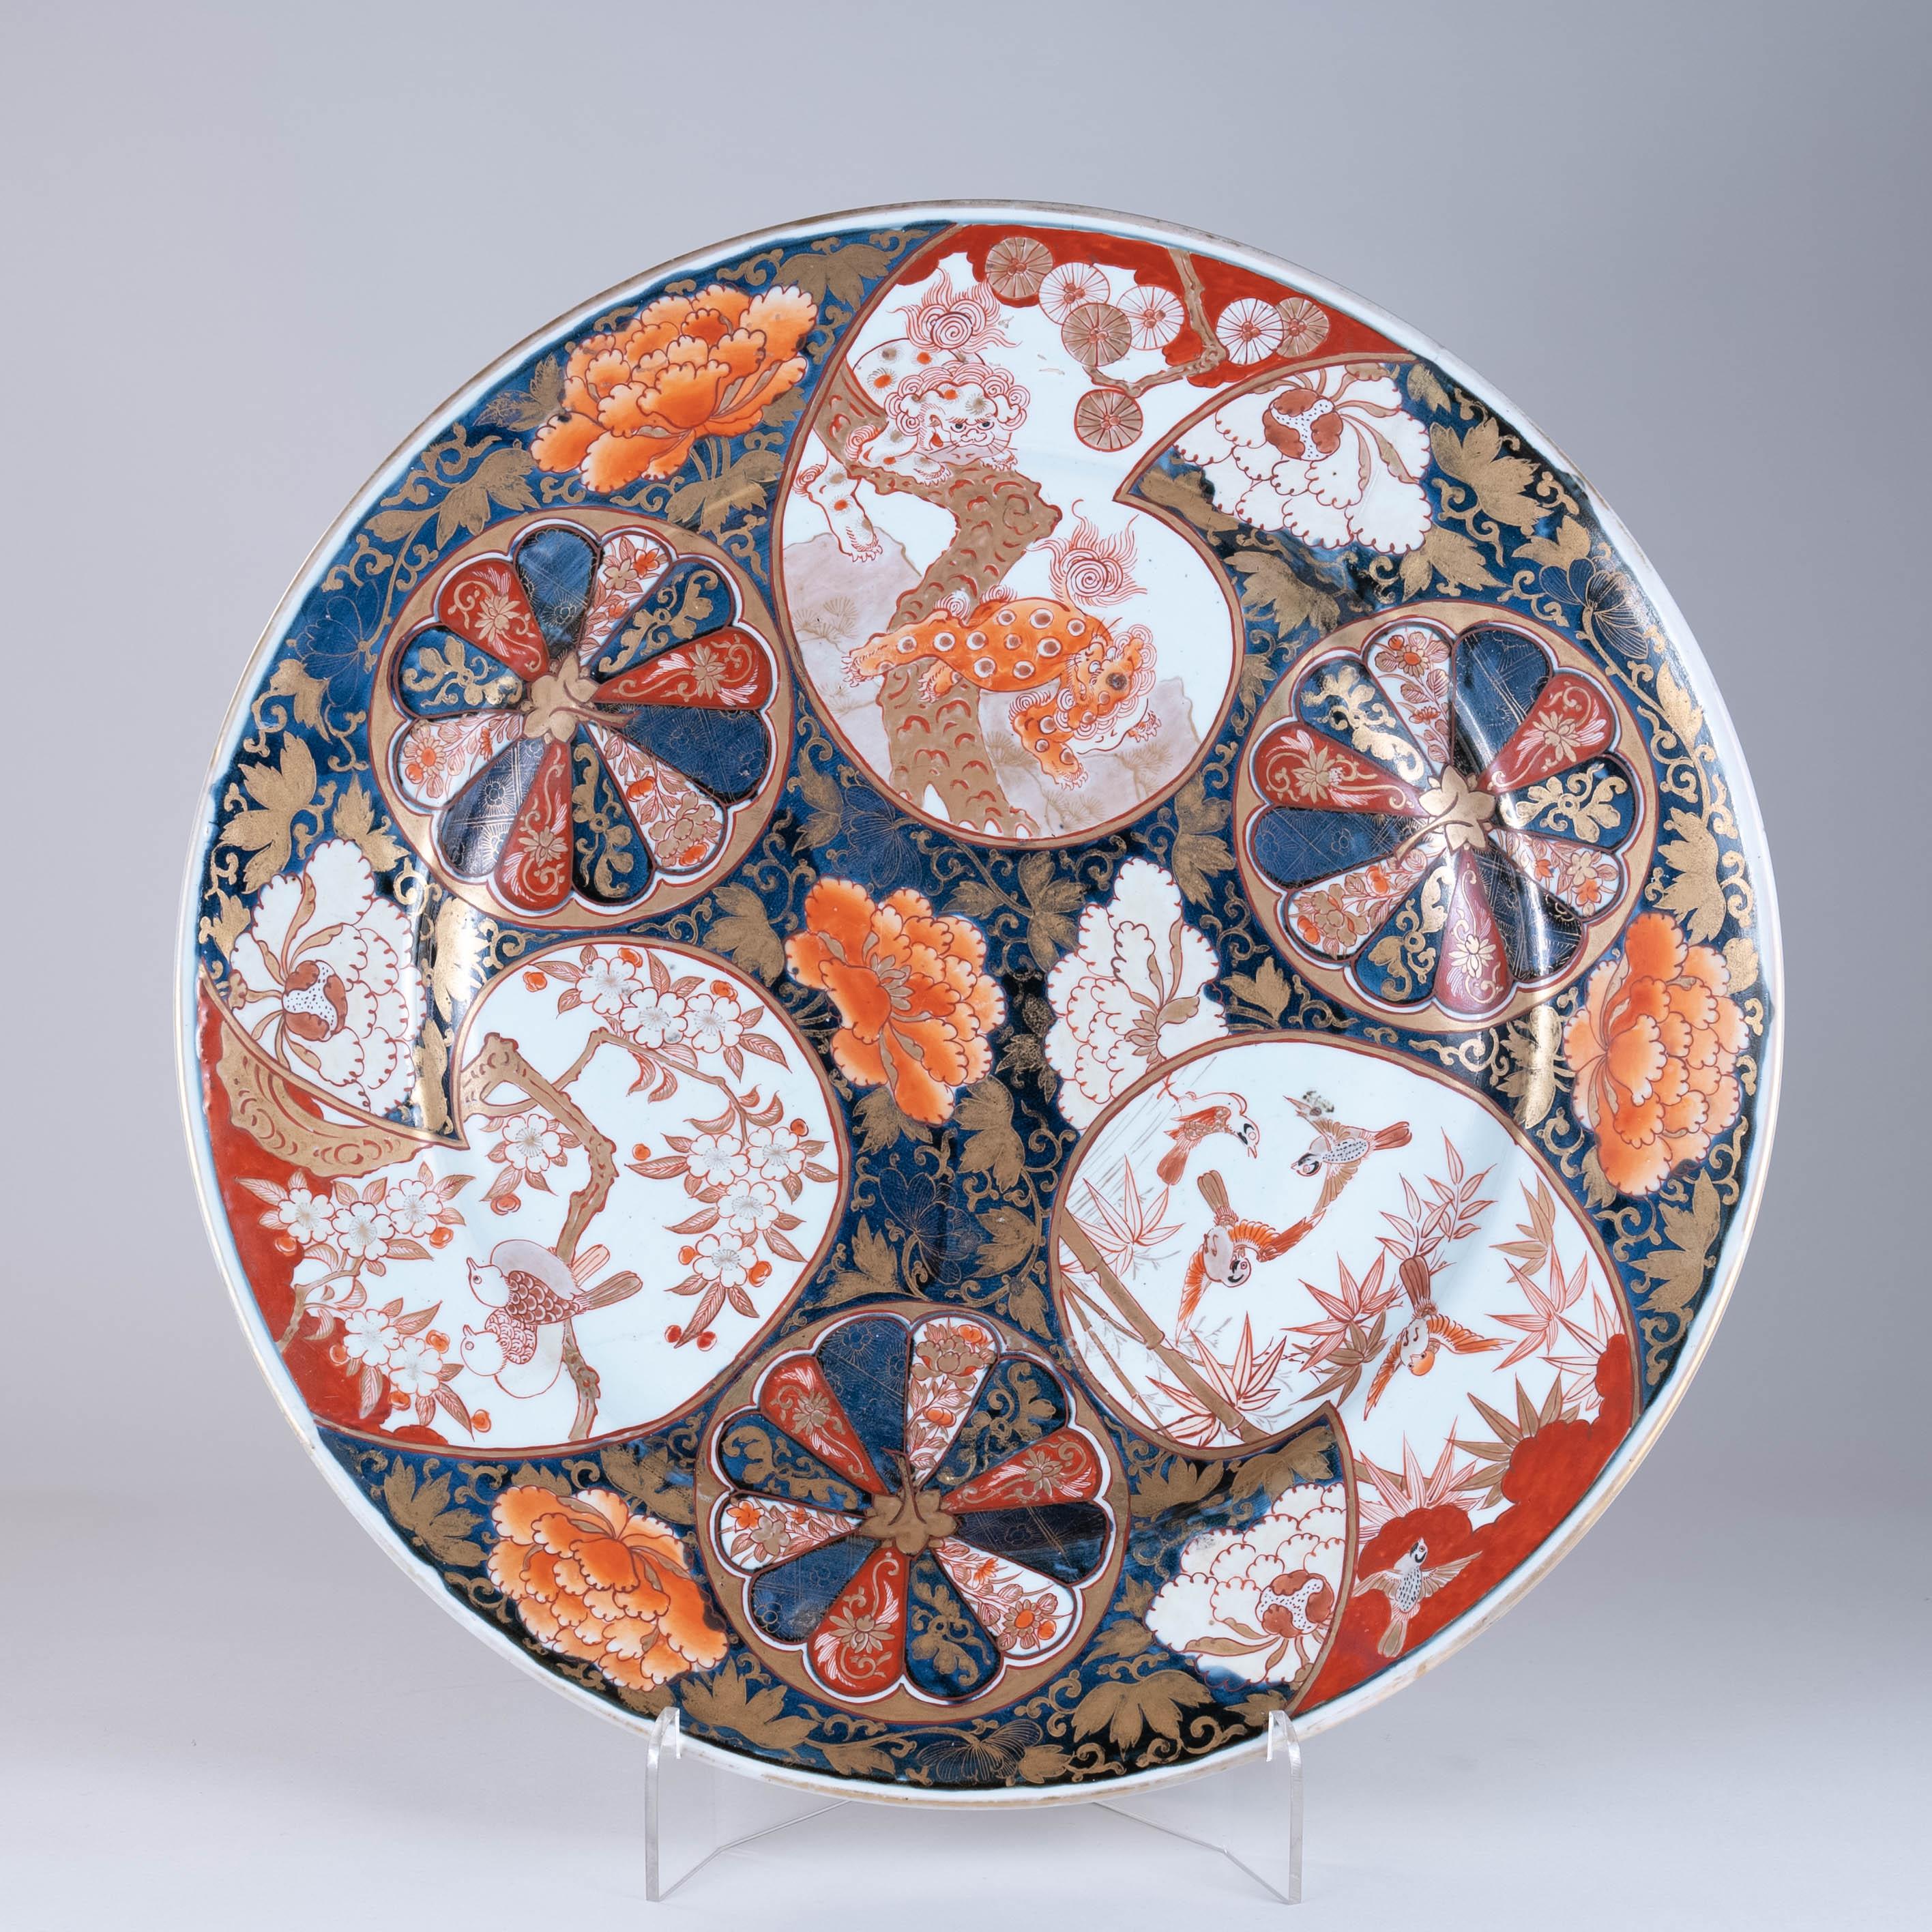 Large 18th Century Japanese Imari Porcelain Charger